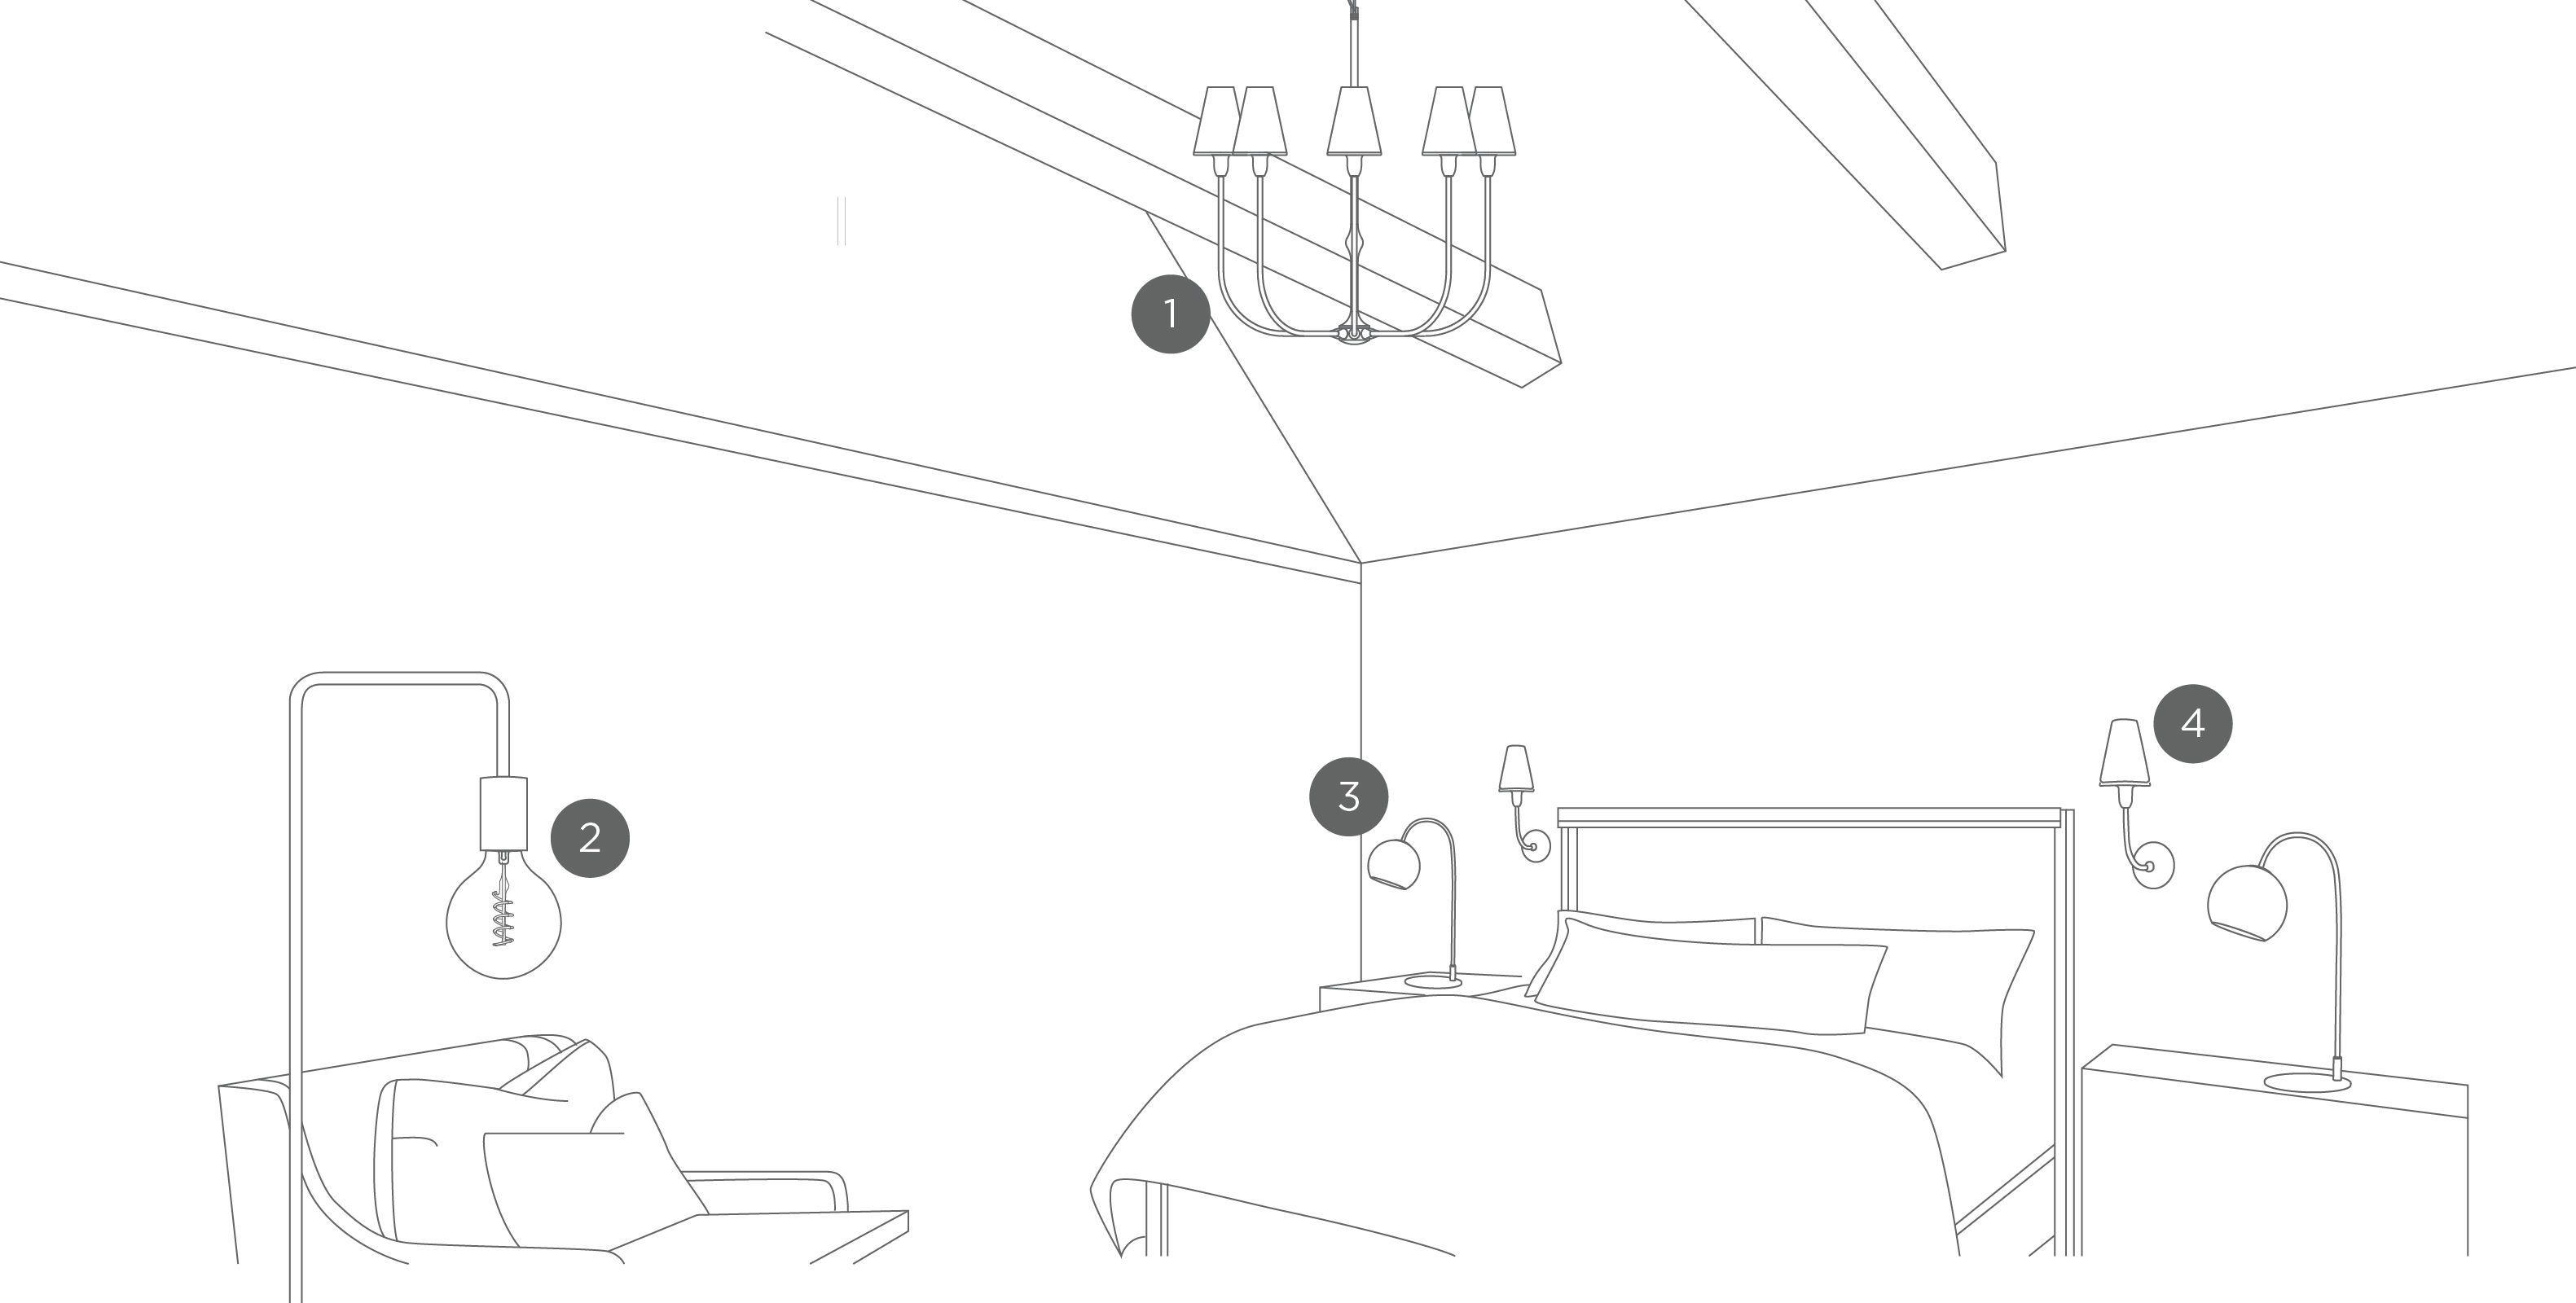 Modern Bedroom Lighting Design Tips And Basics Get This Look Ideas Inspiration Lights Com